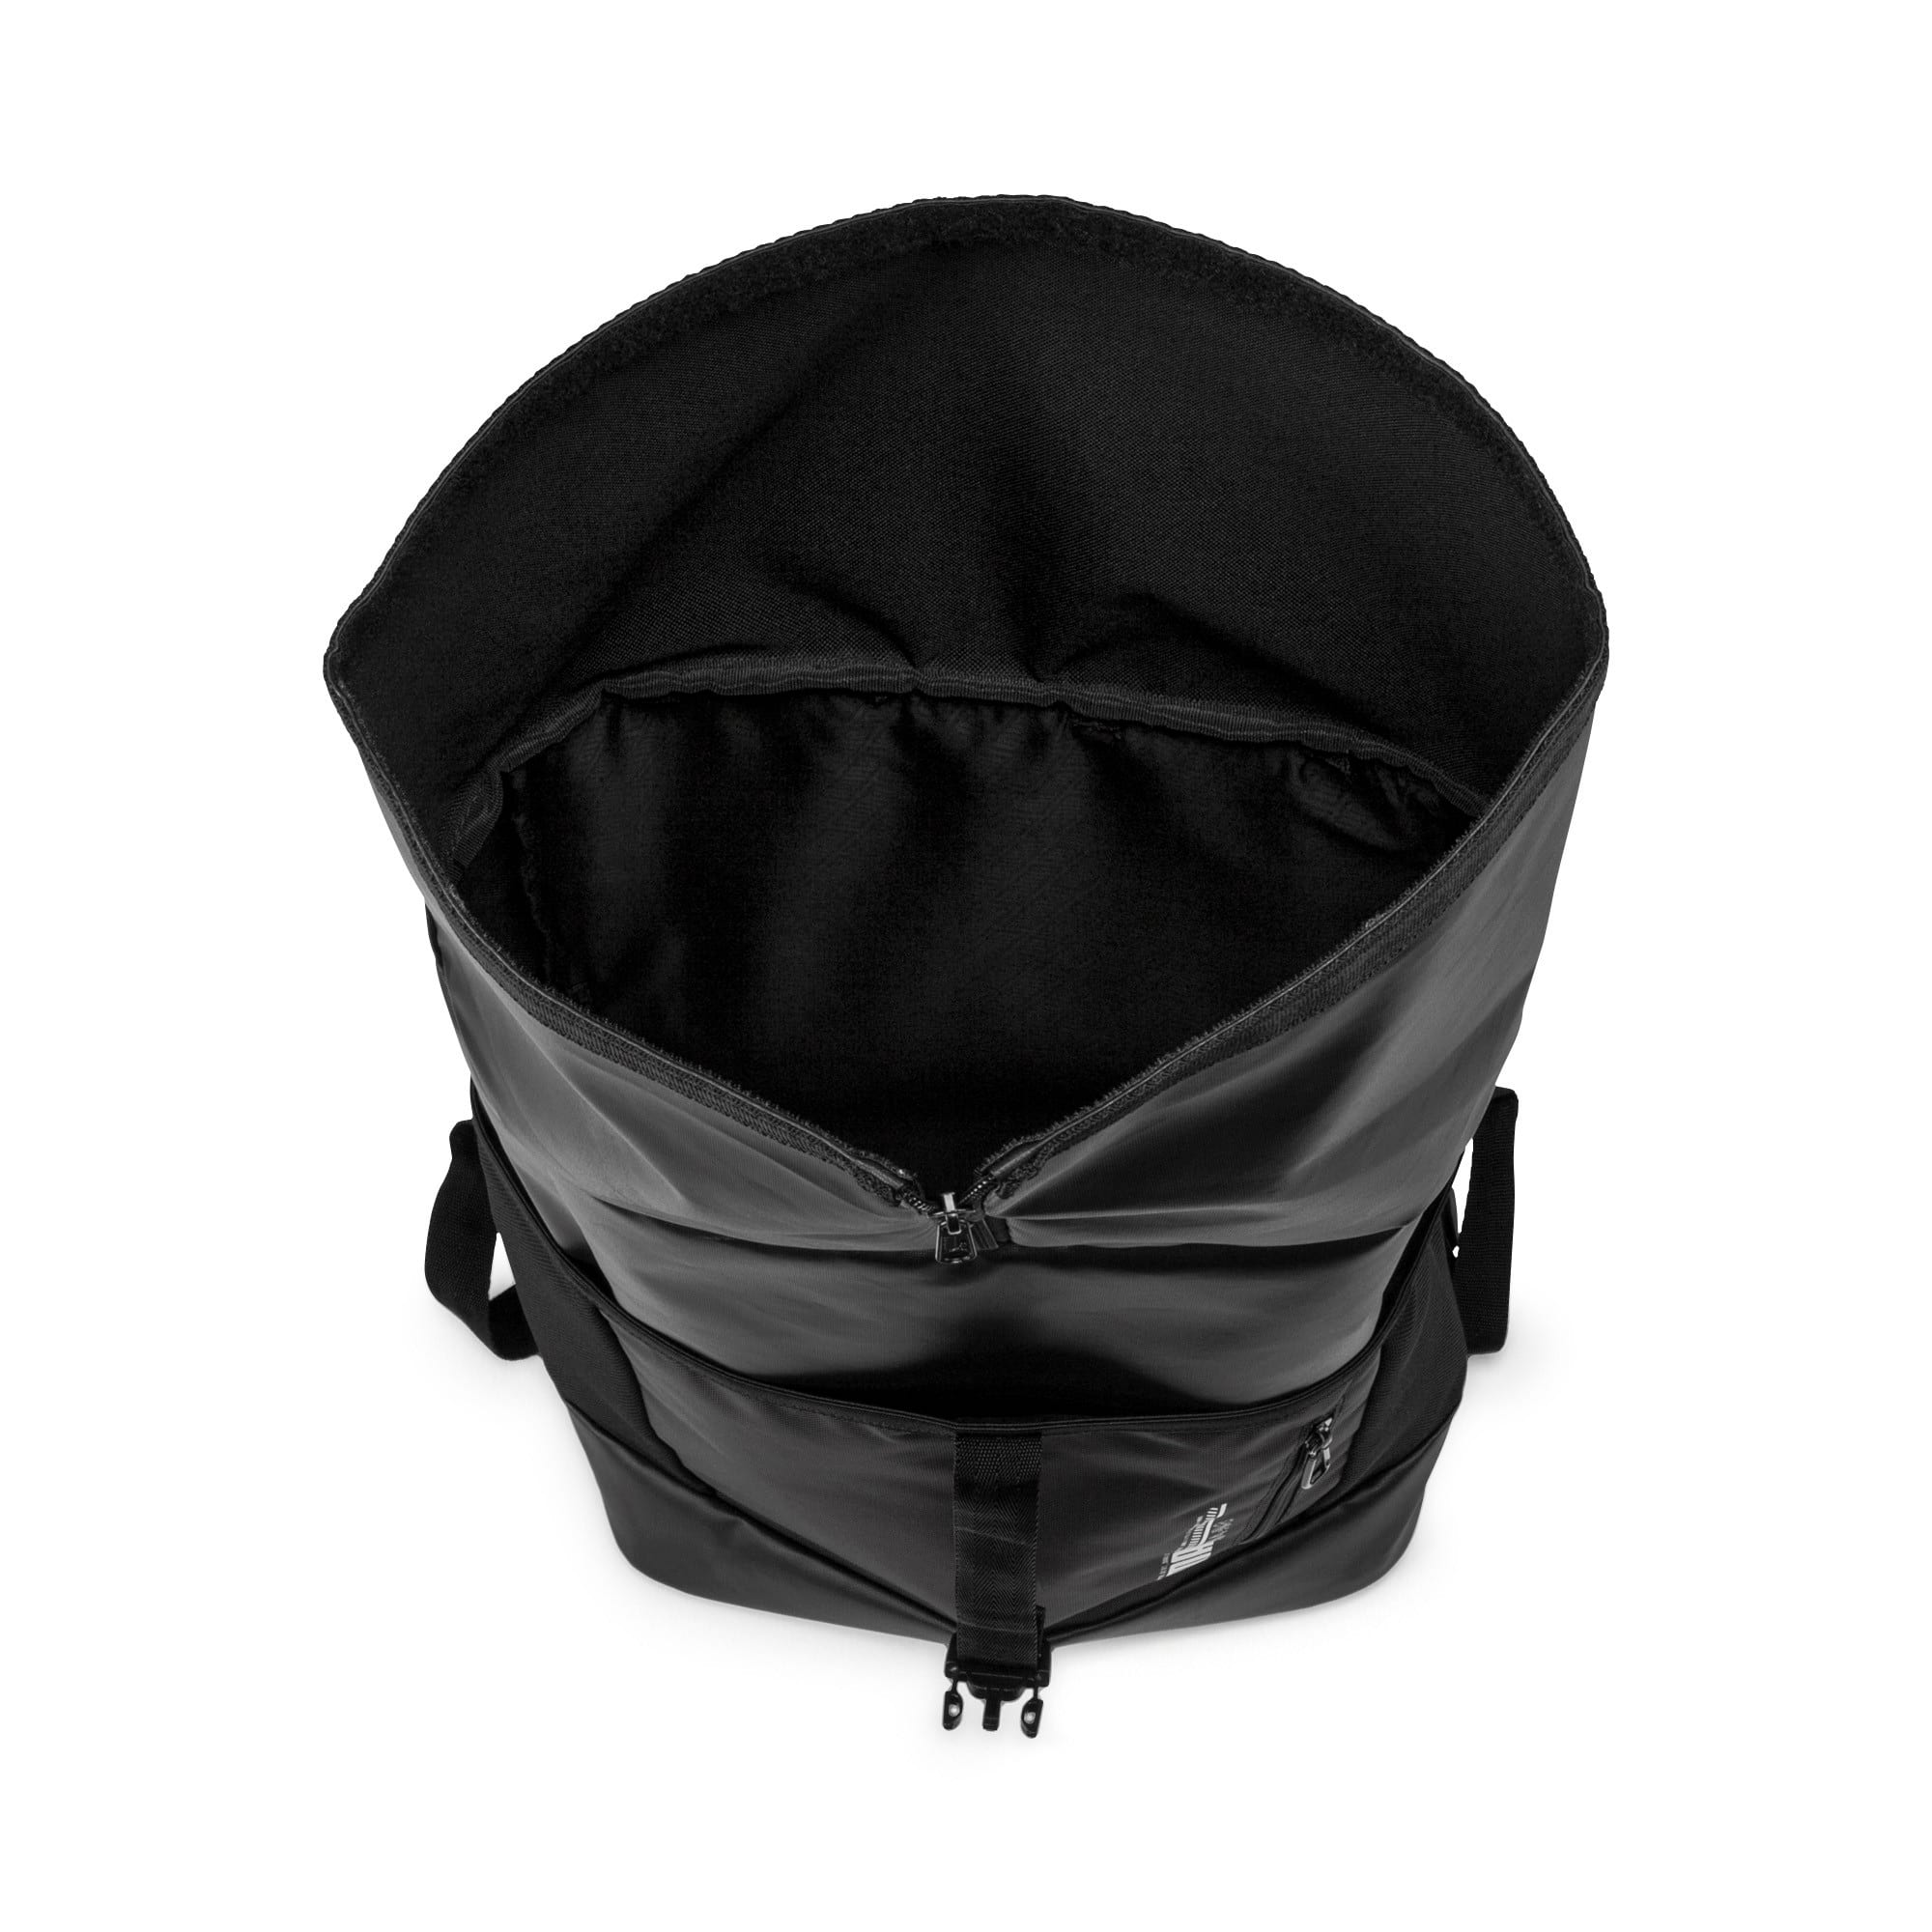 Thumbnail 4 of Energy Rolltop Backpack, Puma Black, medium